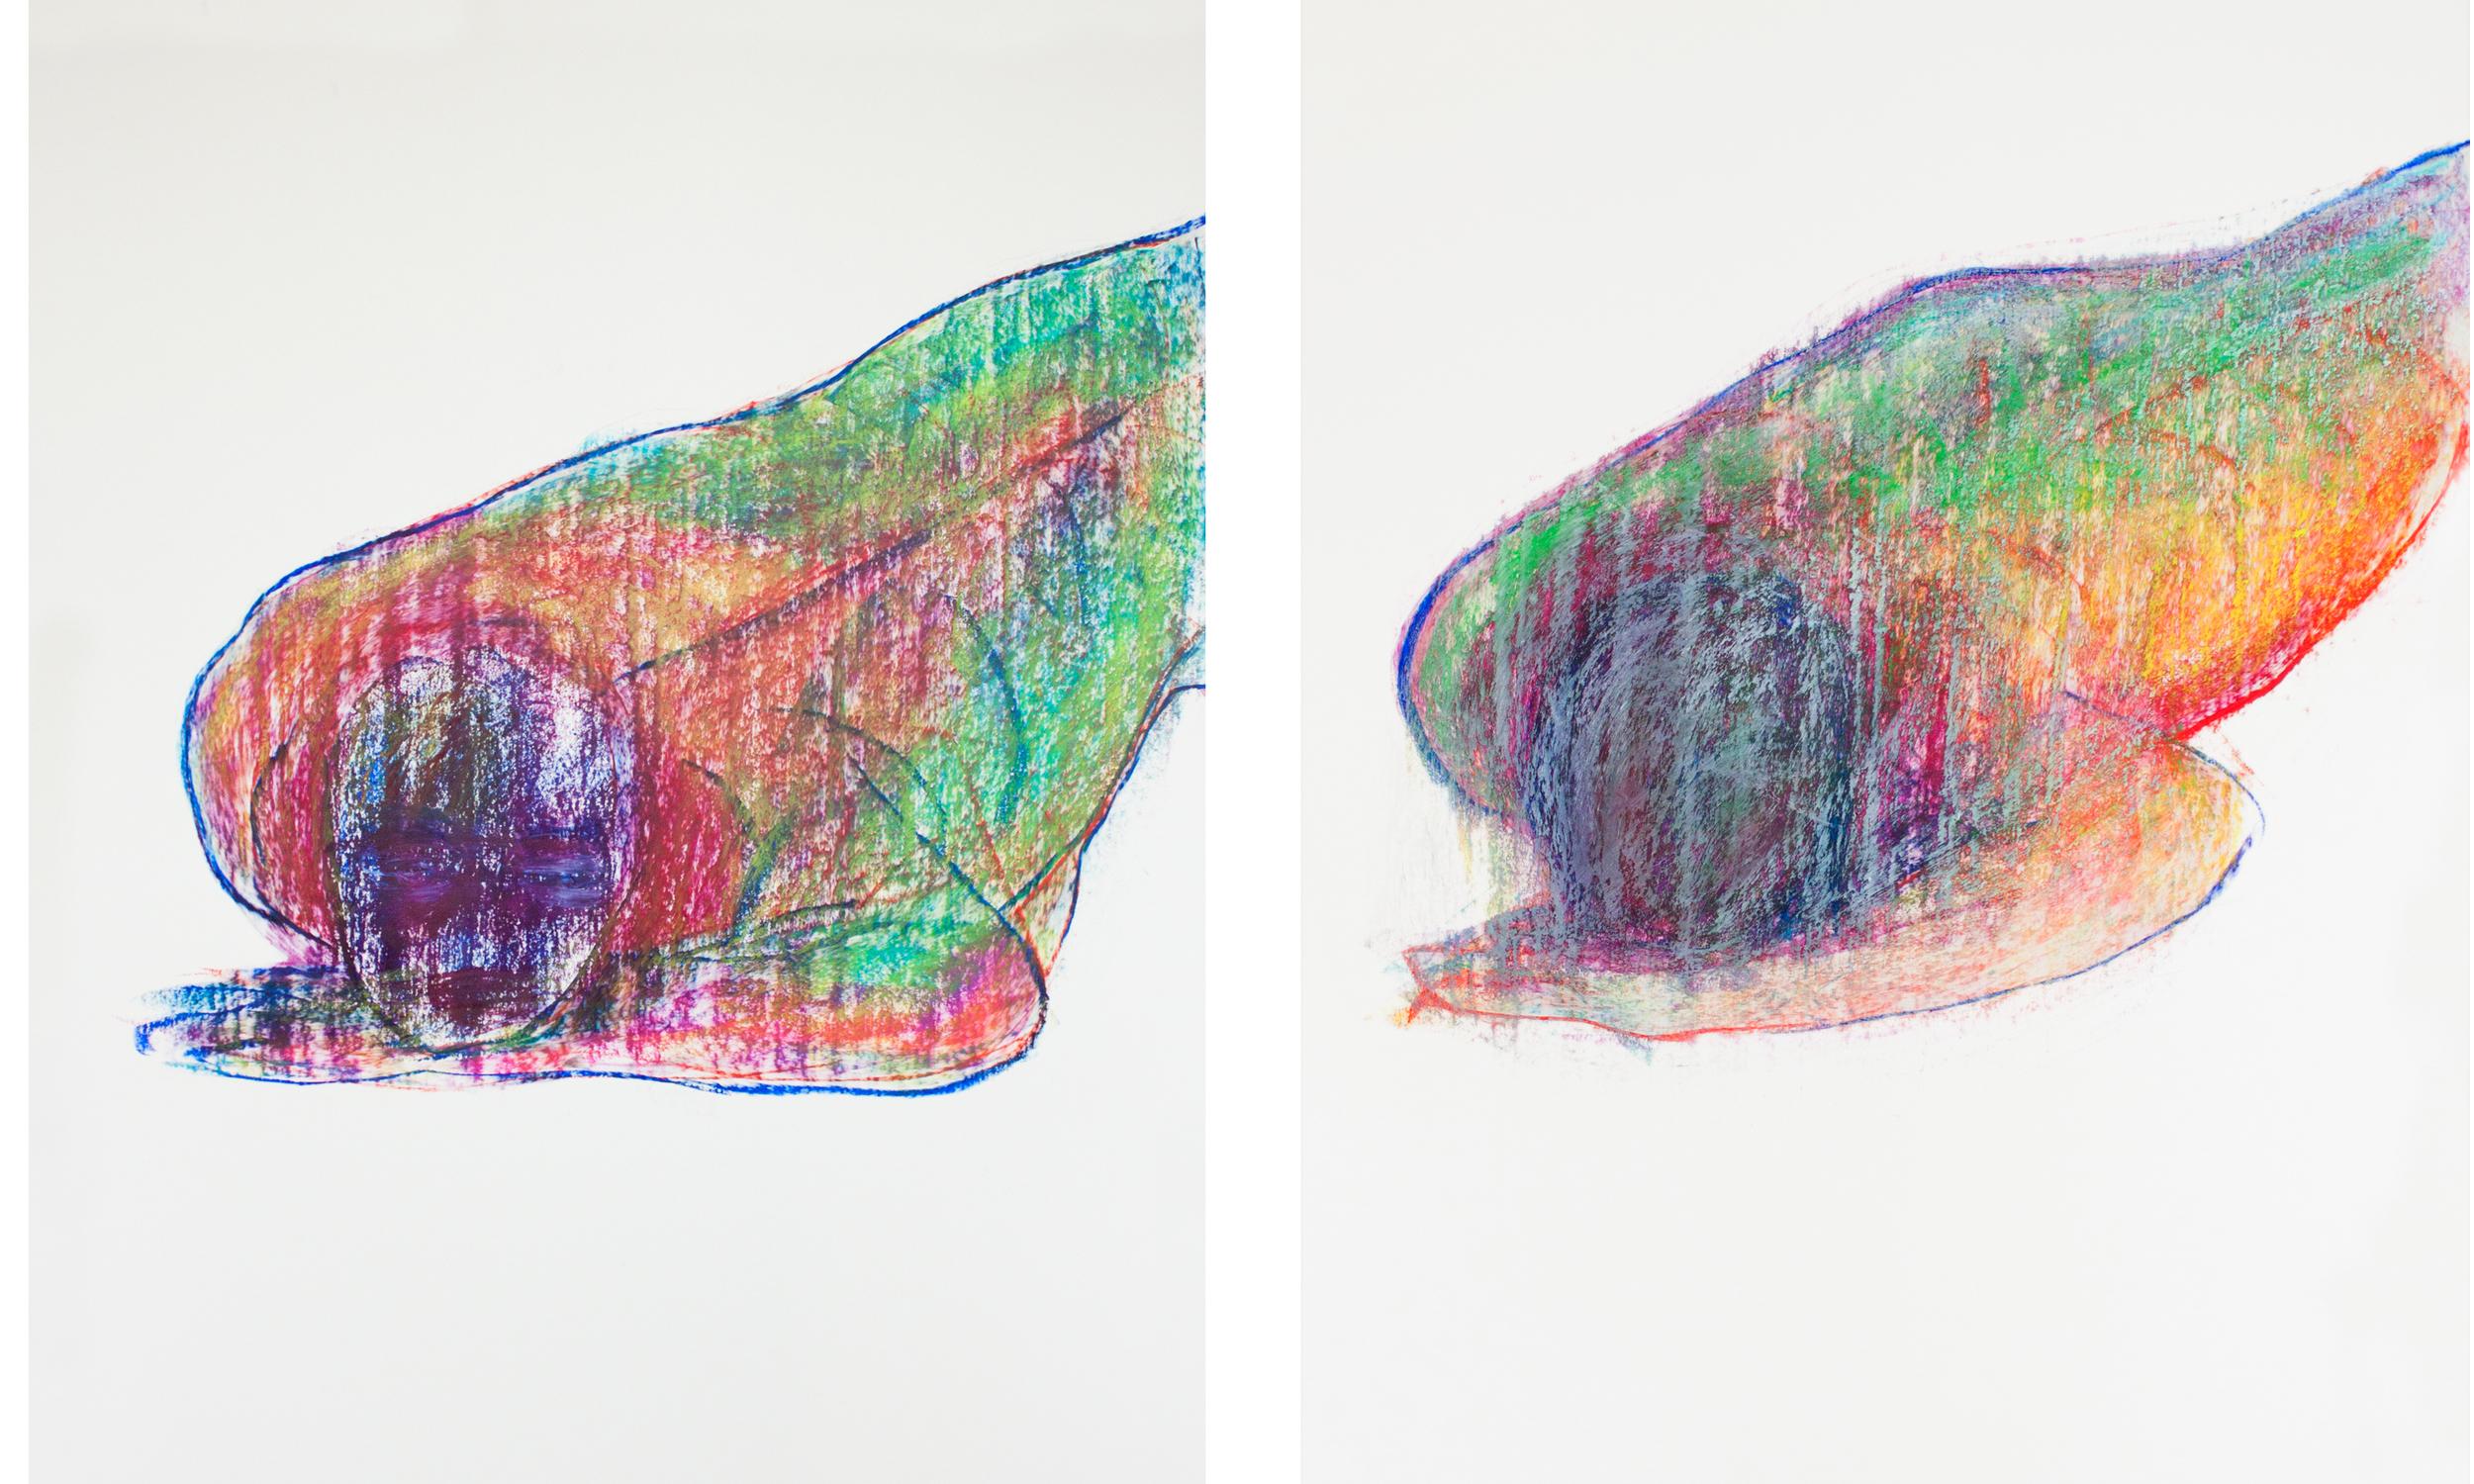 Left, right : oil pastel on paper / 100 x 70 cm / 2016